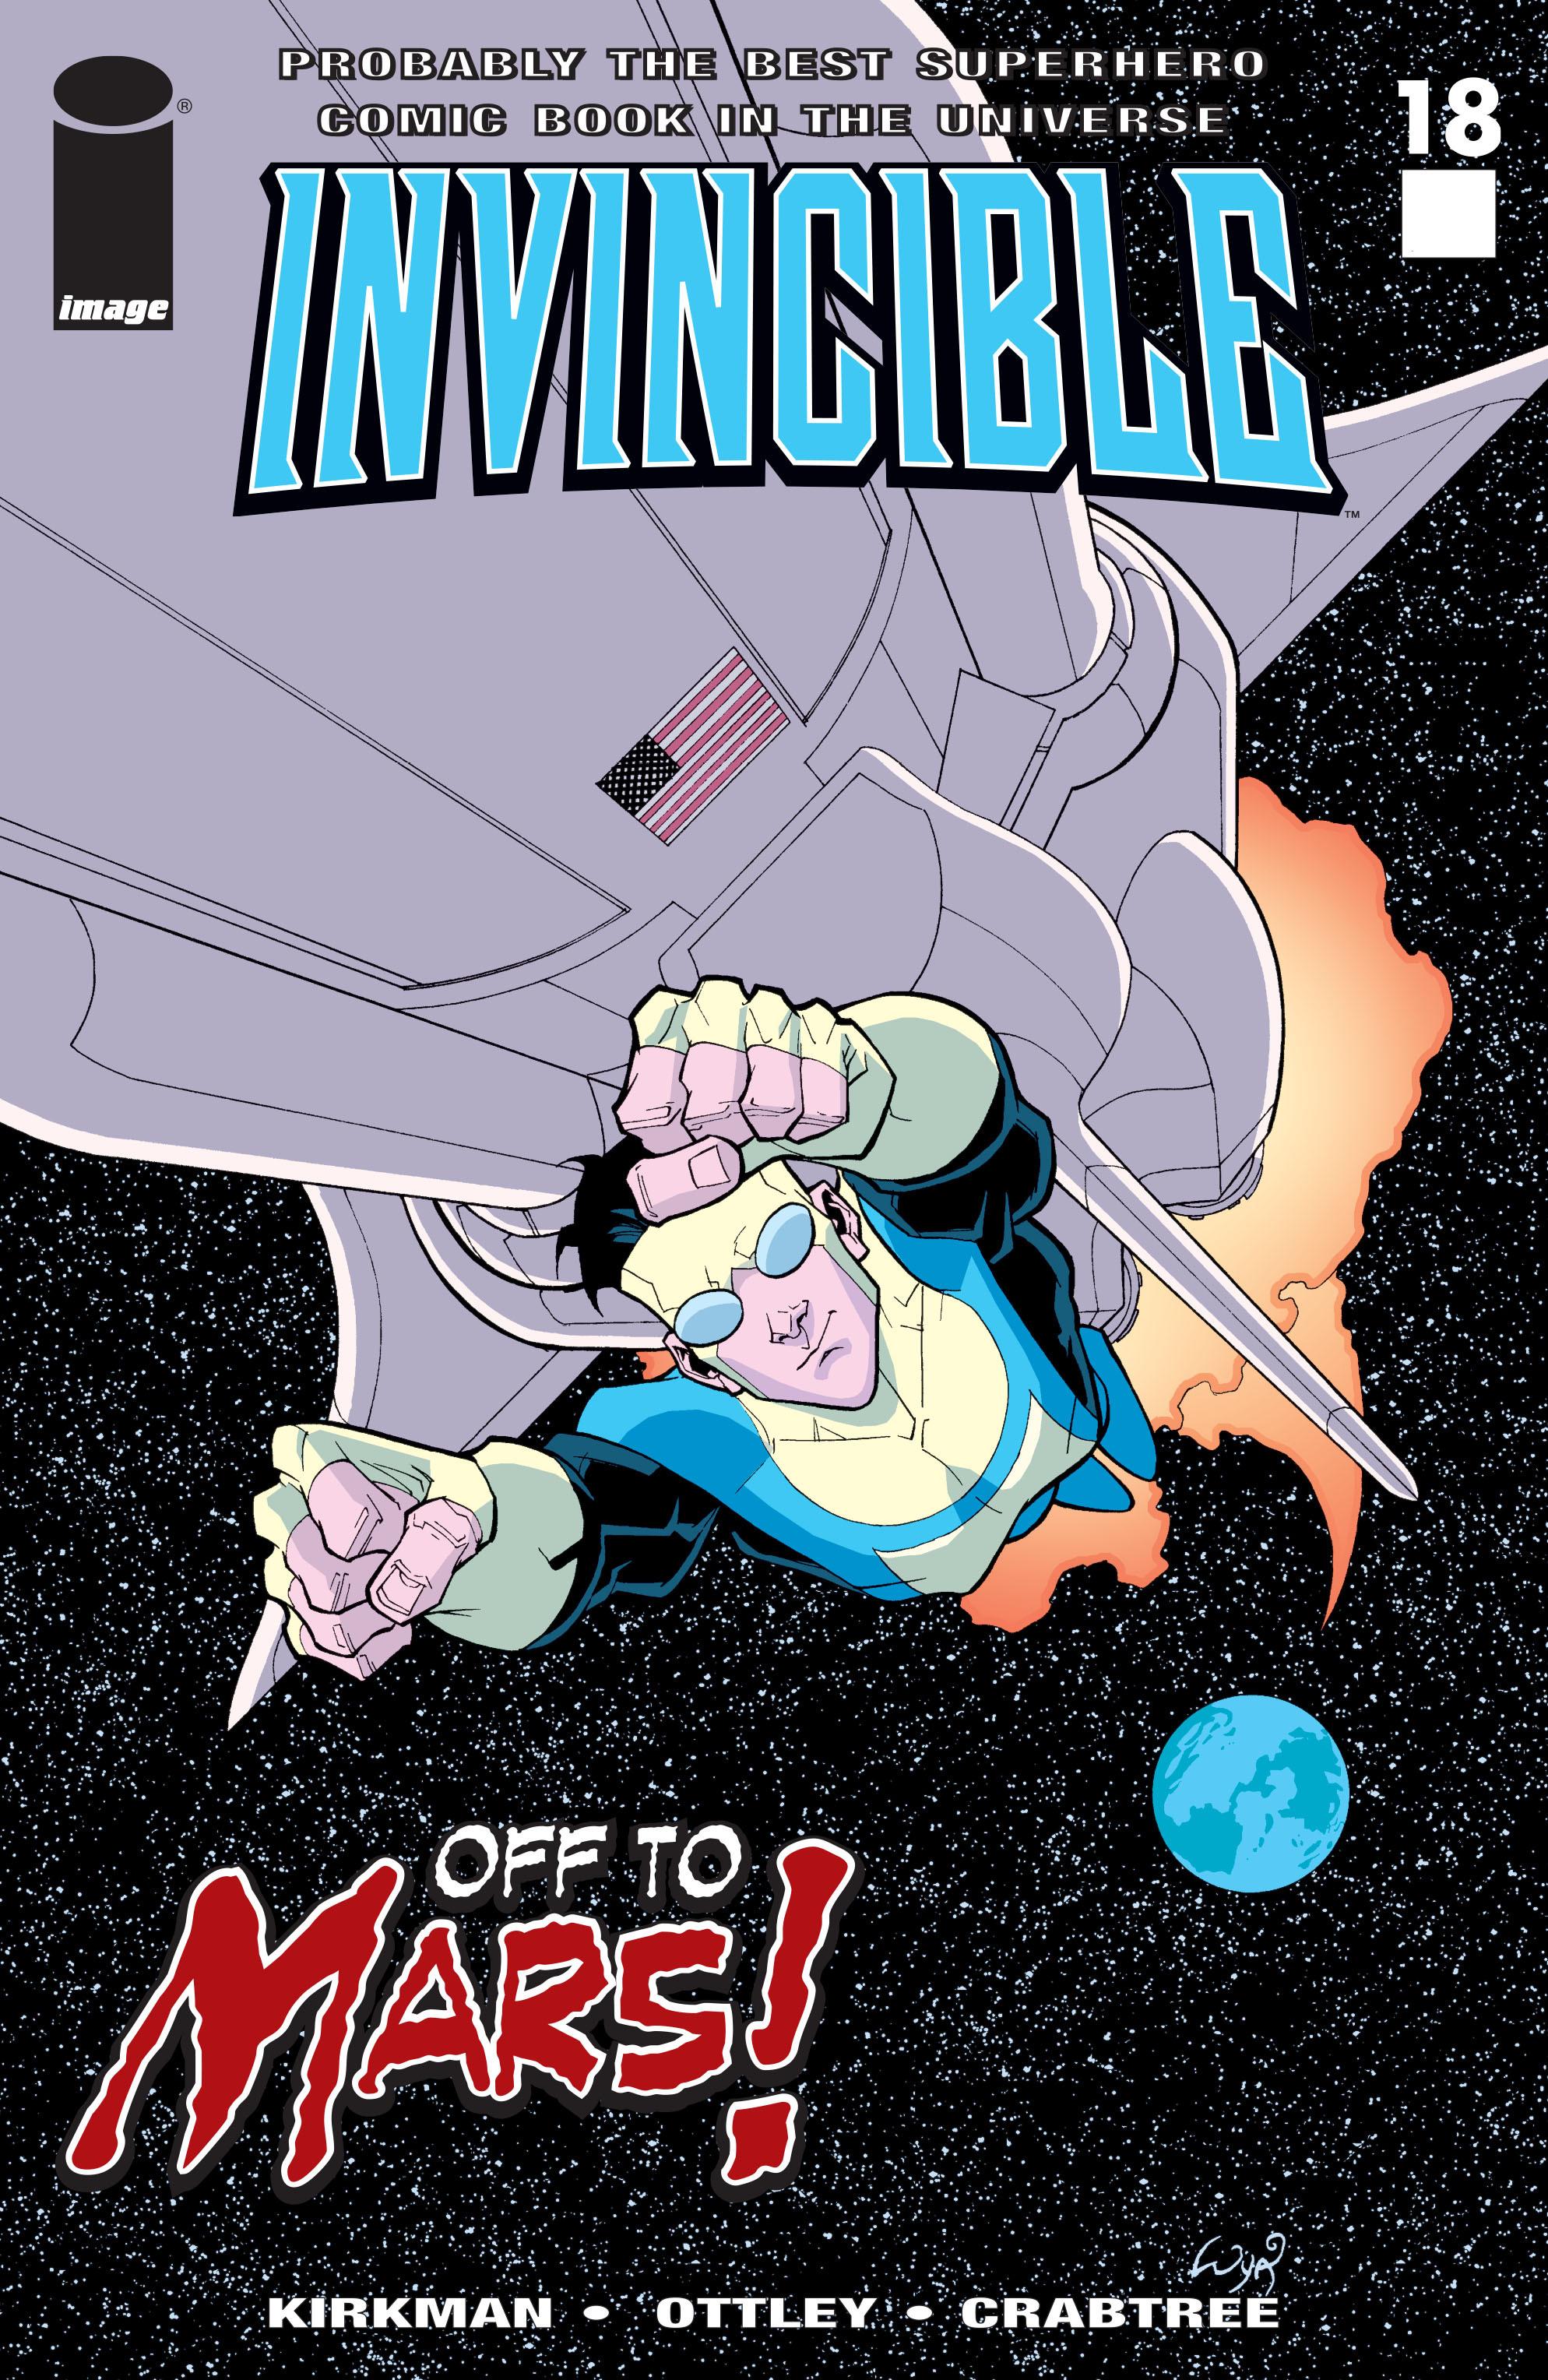 Invincible 18 Page 1